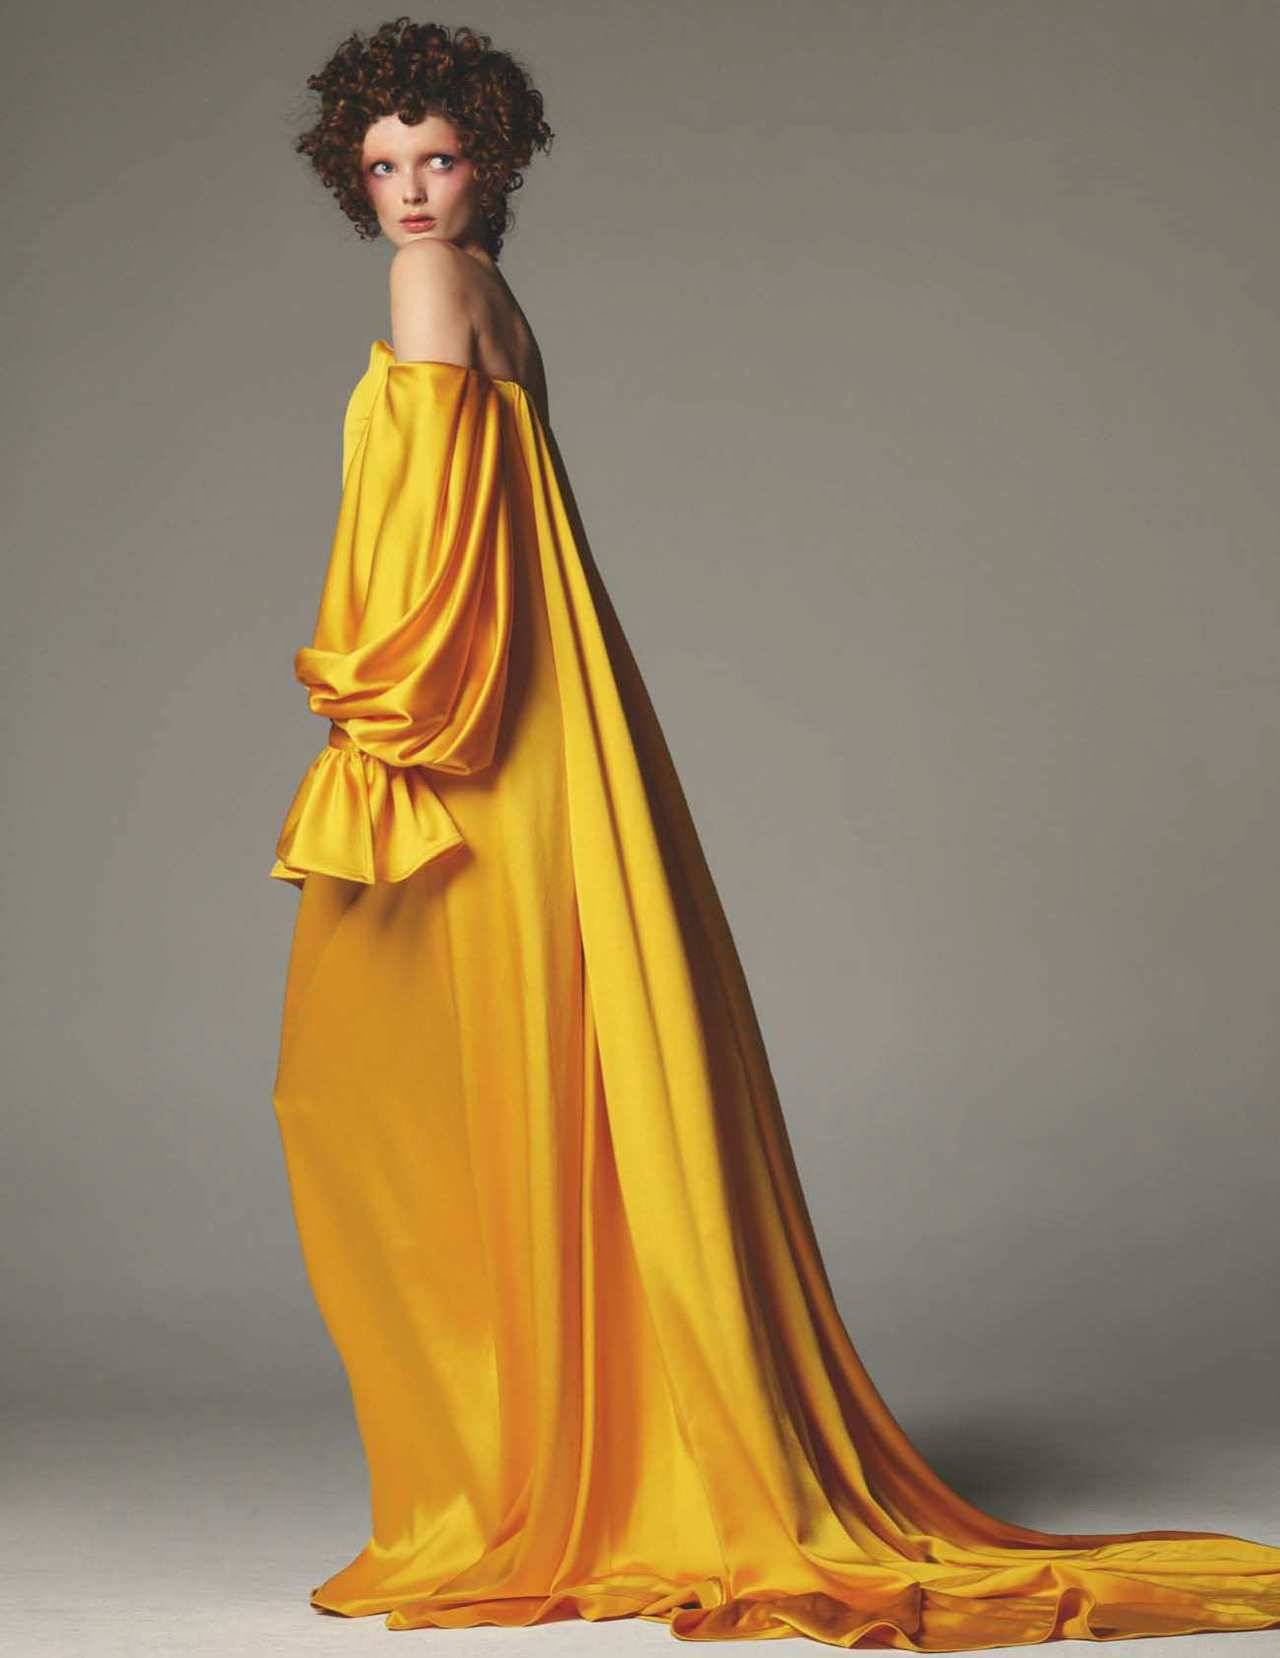 Steven Meisel for Vogue UK Dec 2018 (3).jpg